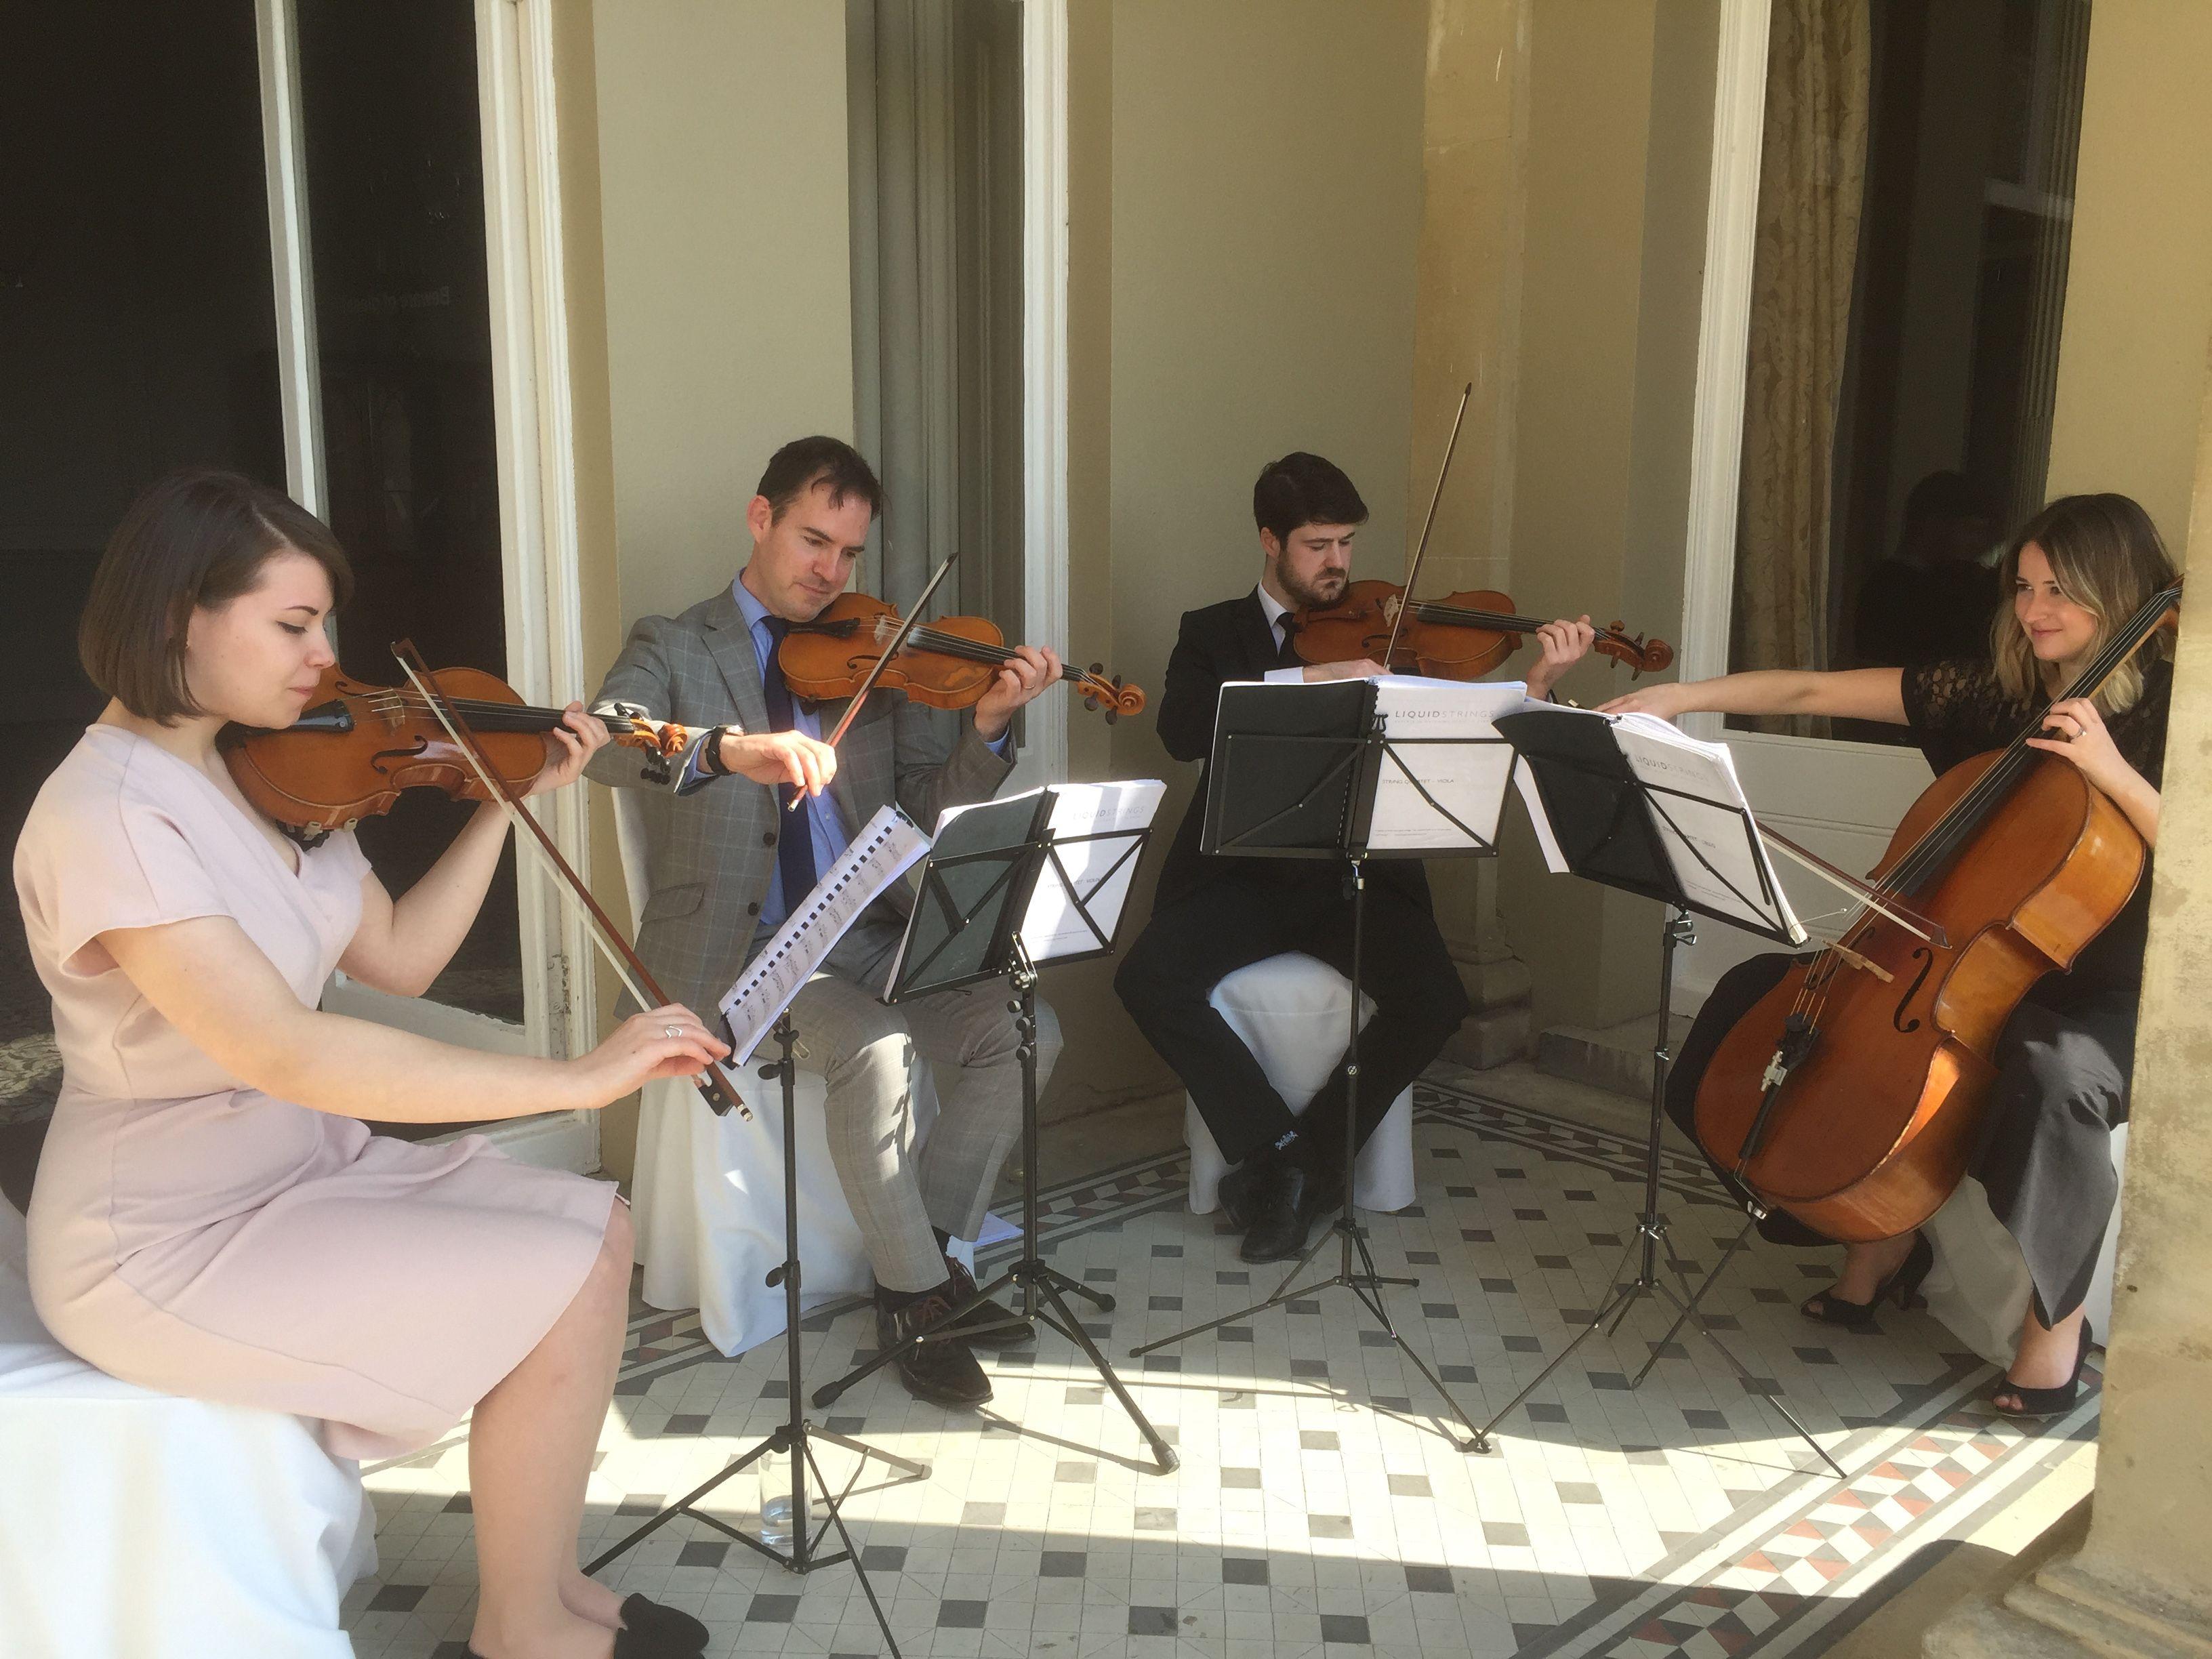 Pin on Wedding String Quartet & Trios in London